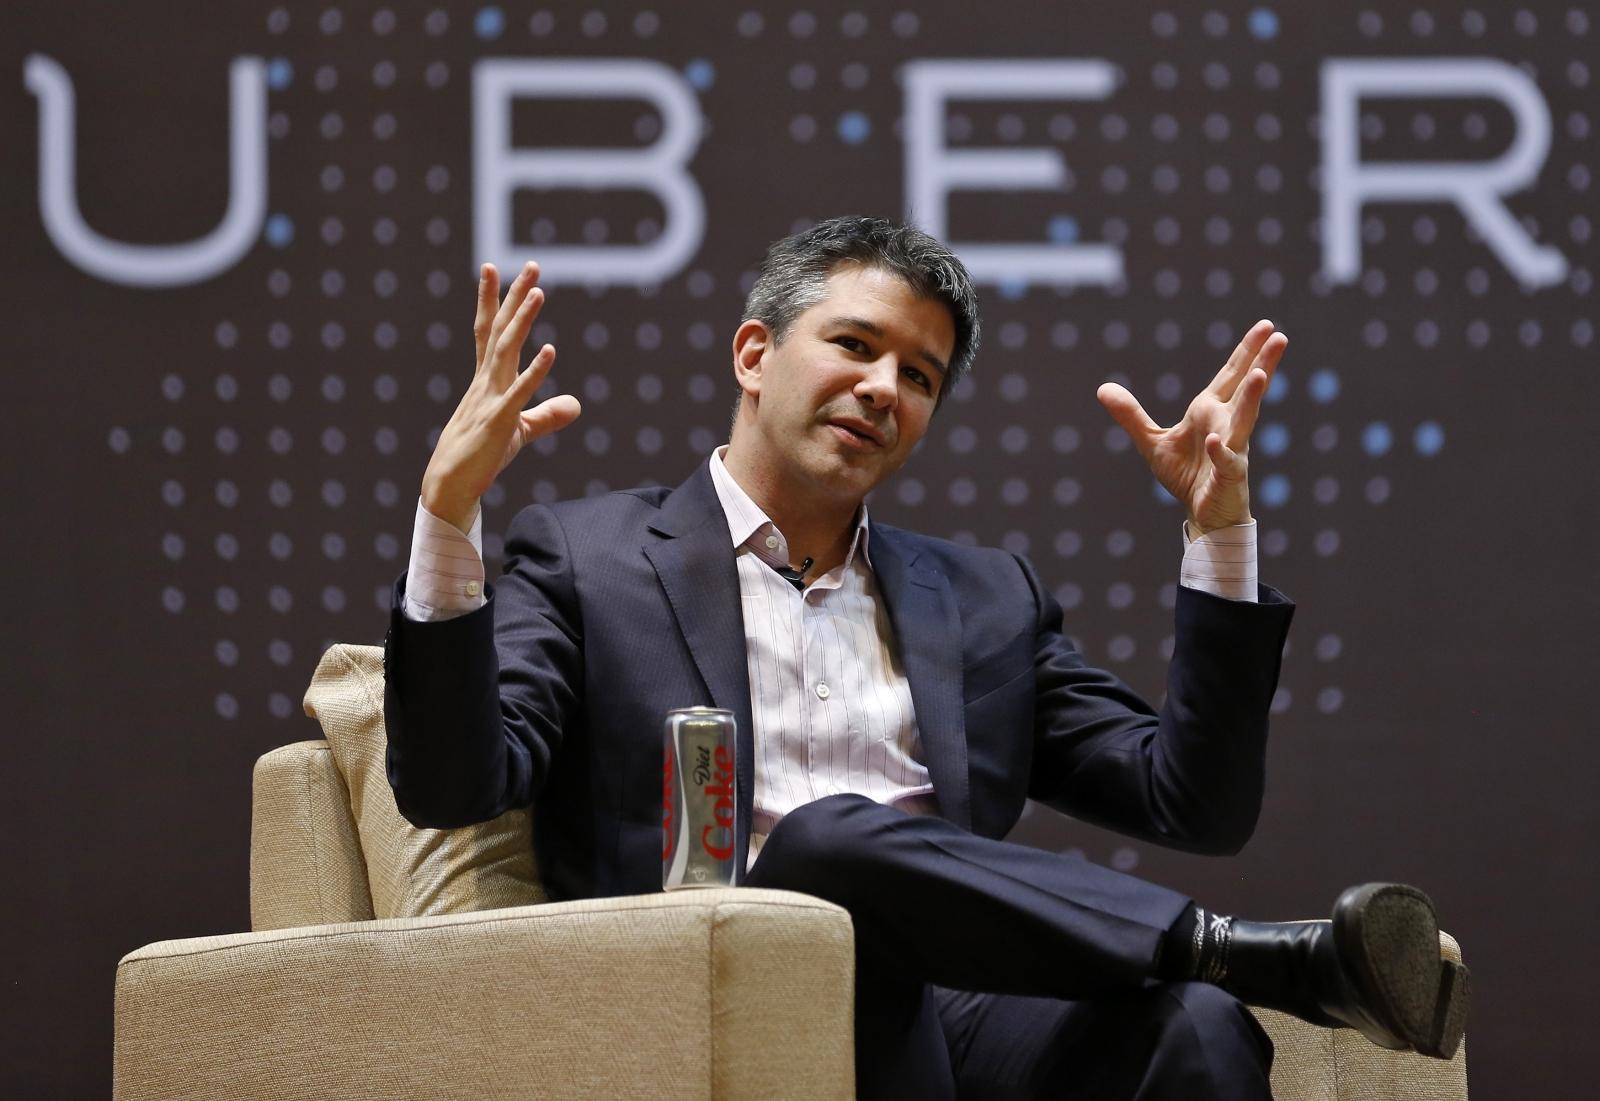 Uber CEO Travis Kalanick